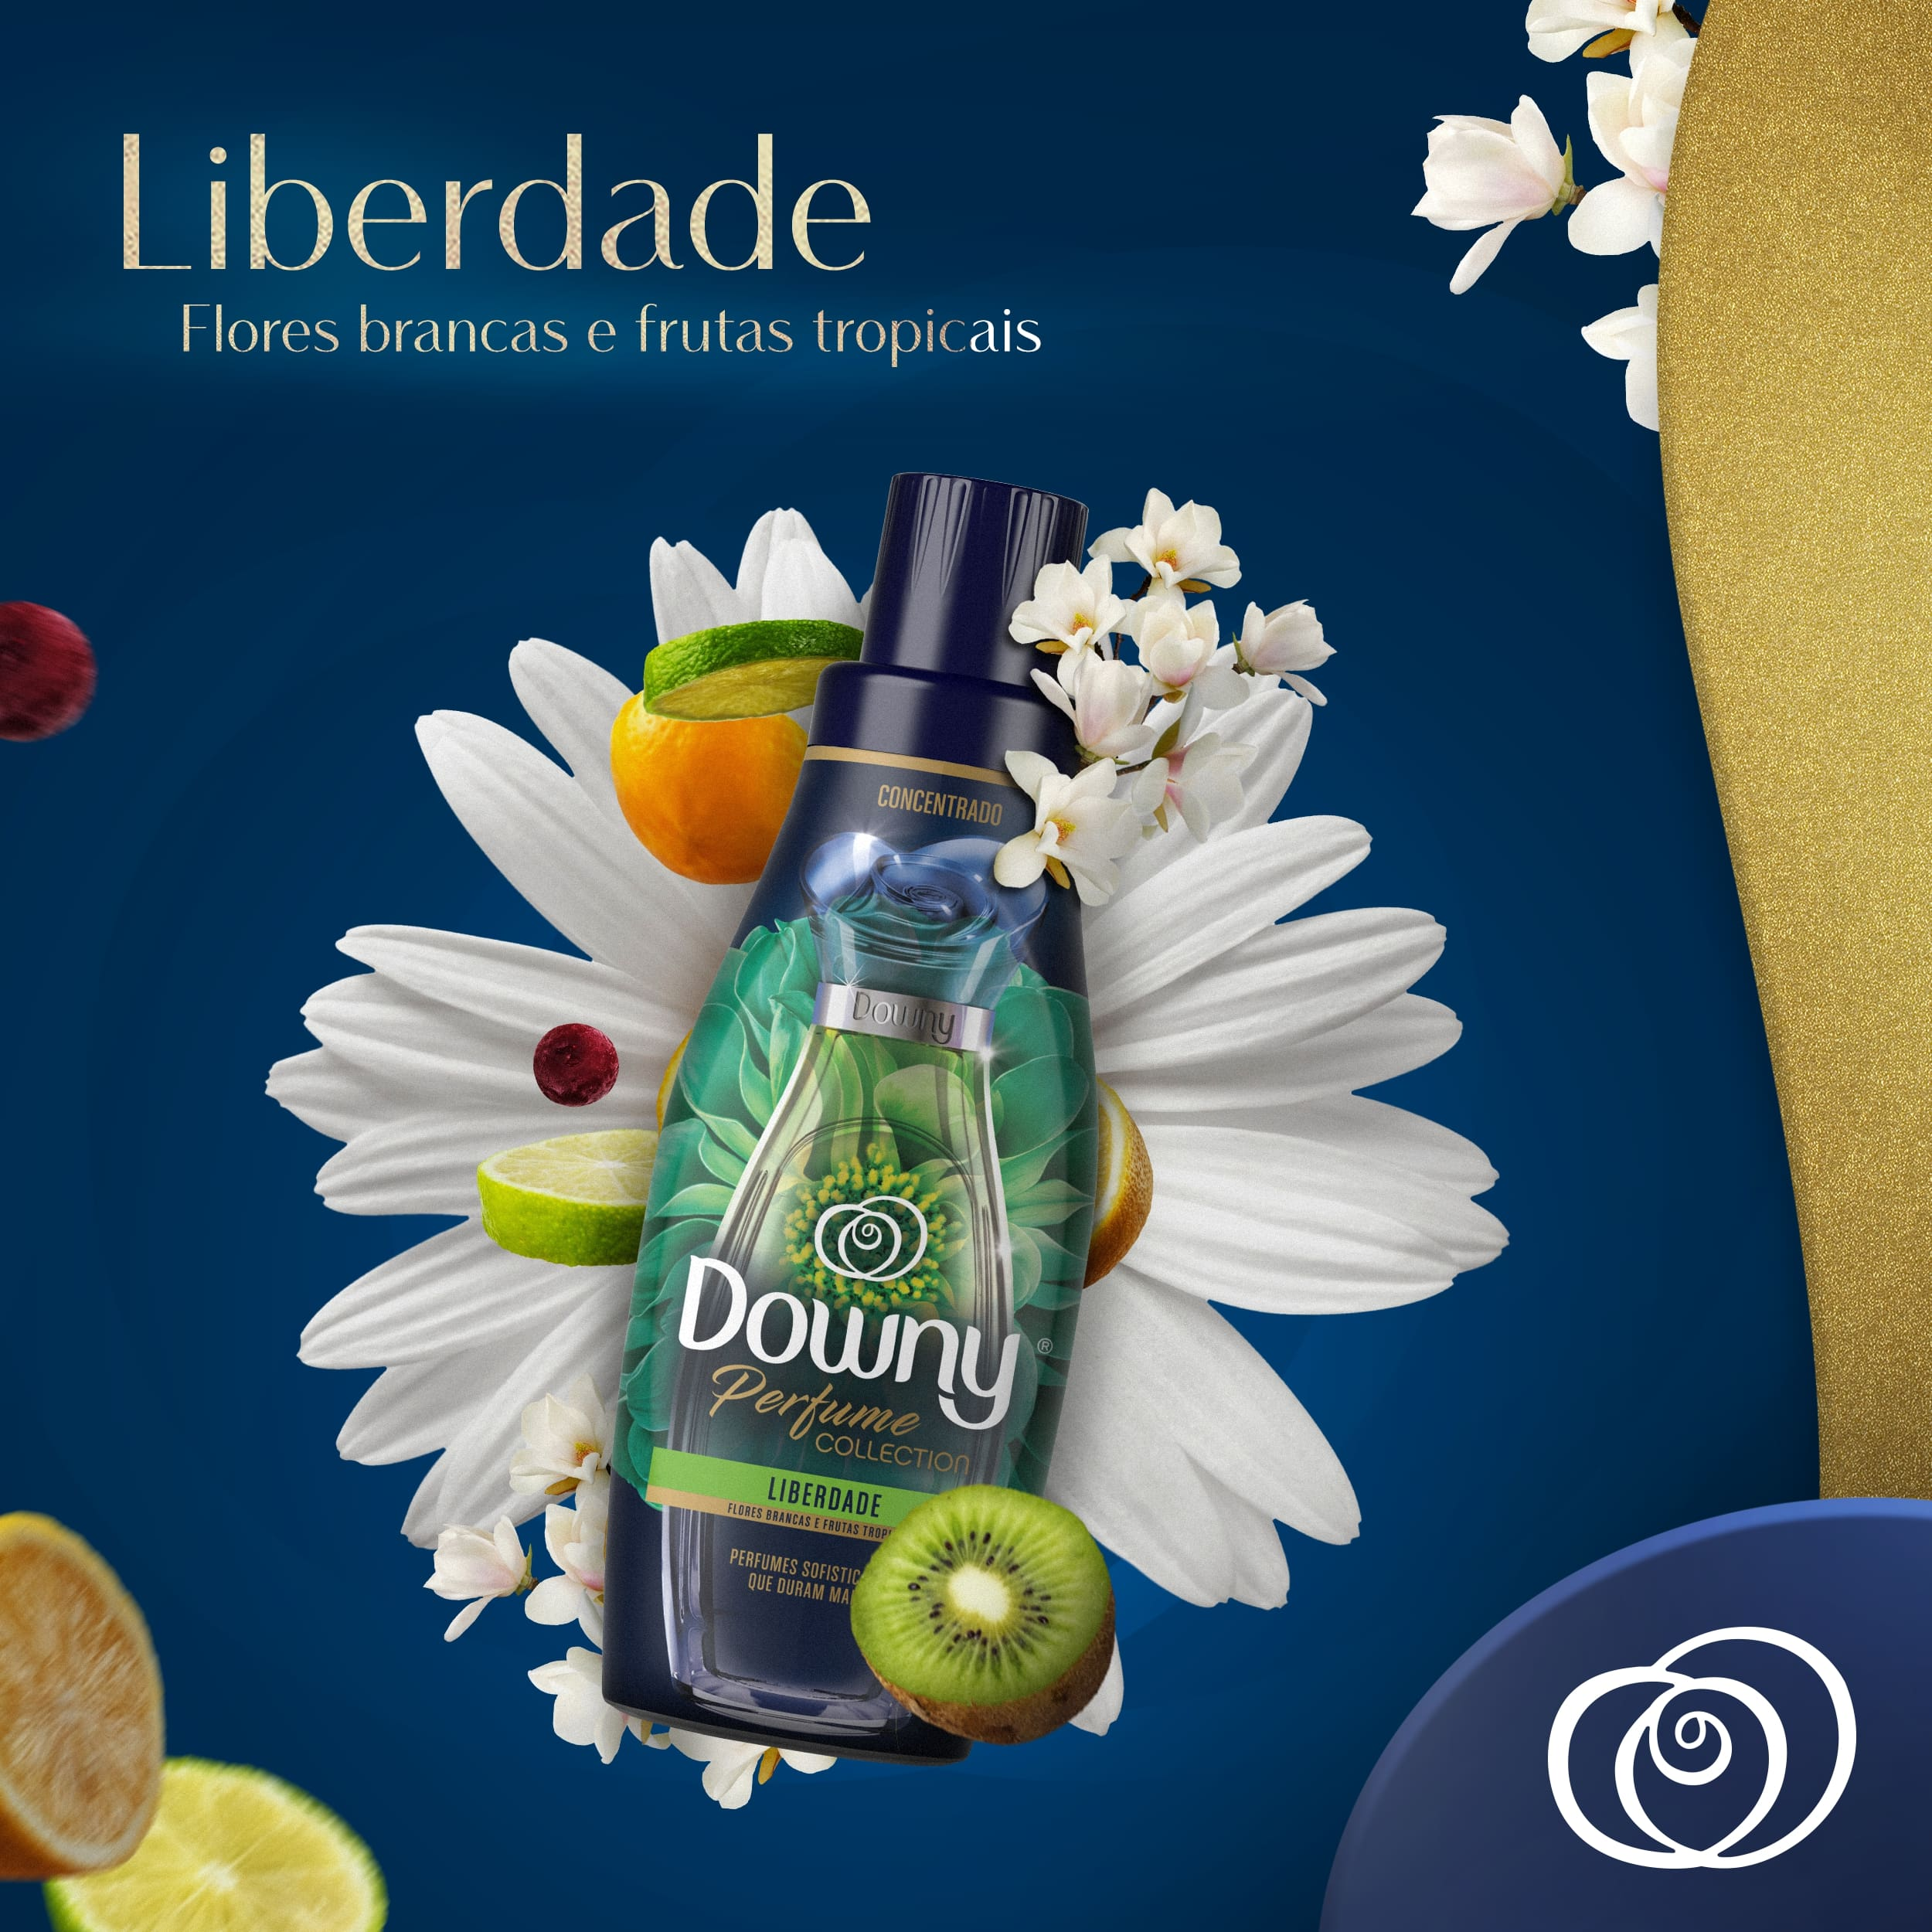 Amaciante Downy Perfume Collection Liberdade Secondary 02